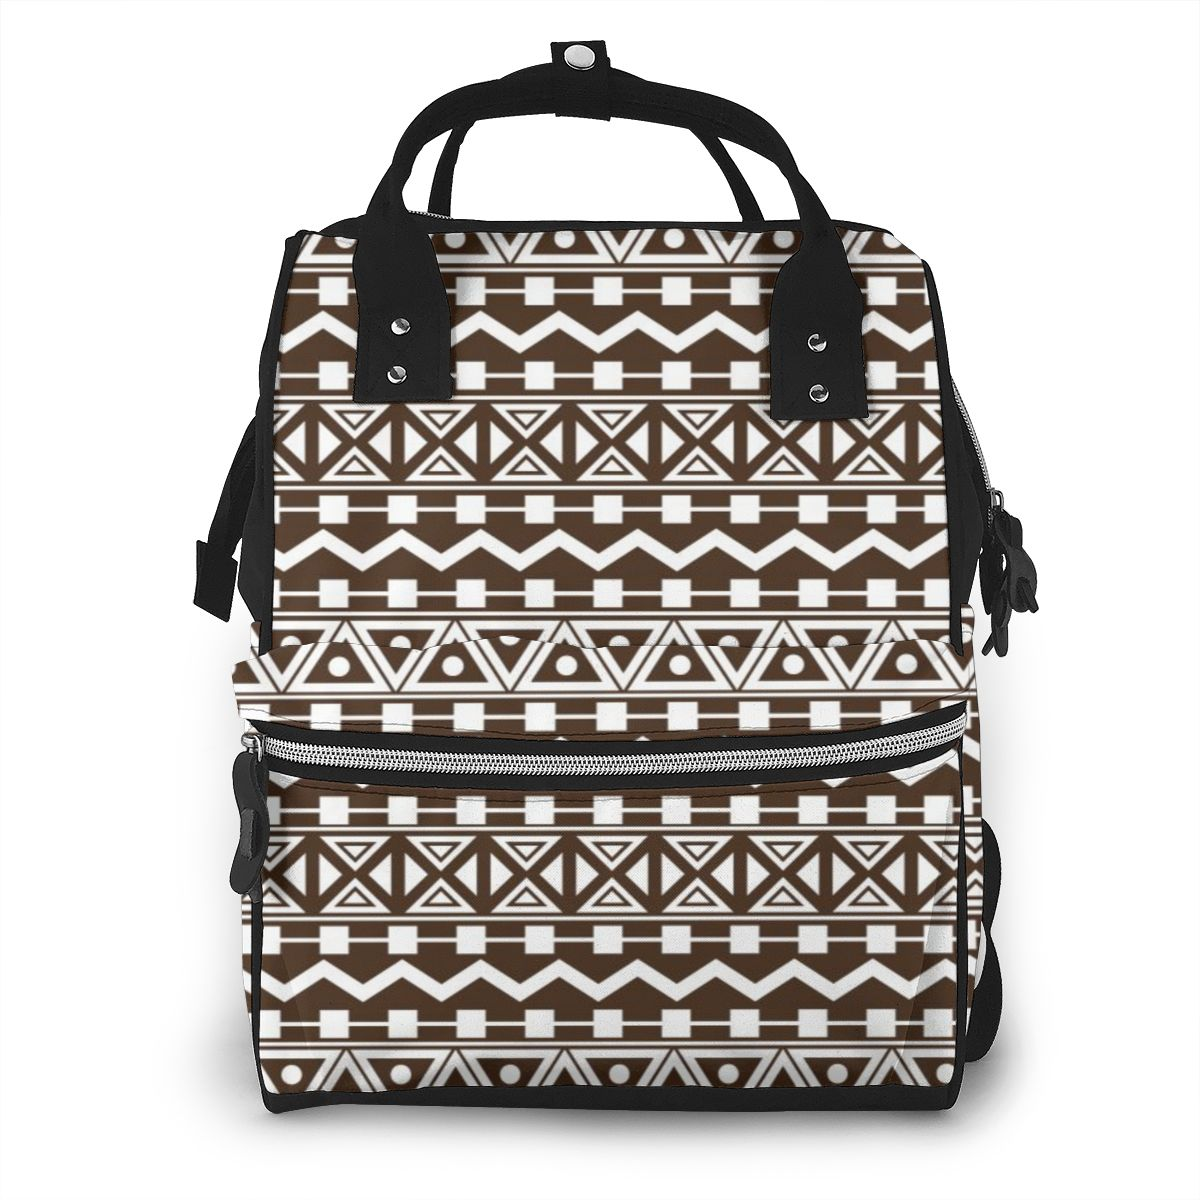 Bolsa de pañales Tribal azteca, mochila de gran capacidad para cochecito, bolsa de bebé para mamá, bolsas de pañales impermeables multifunción para exteriores